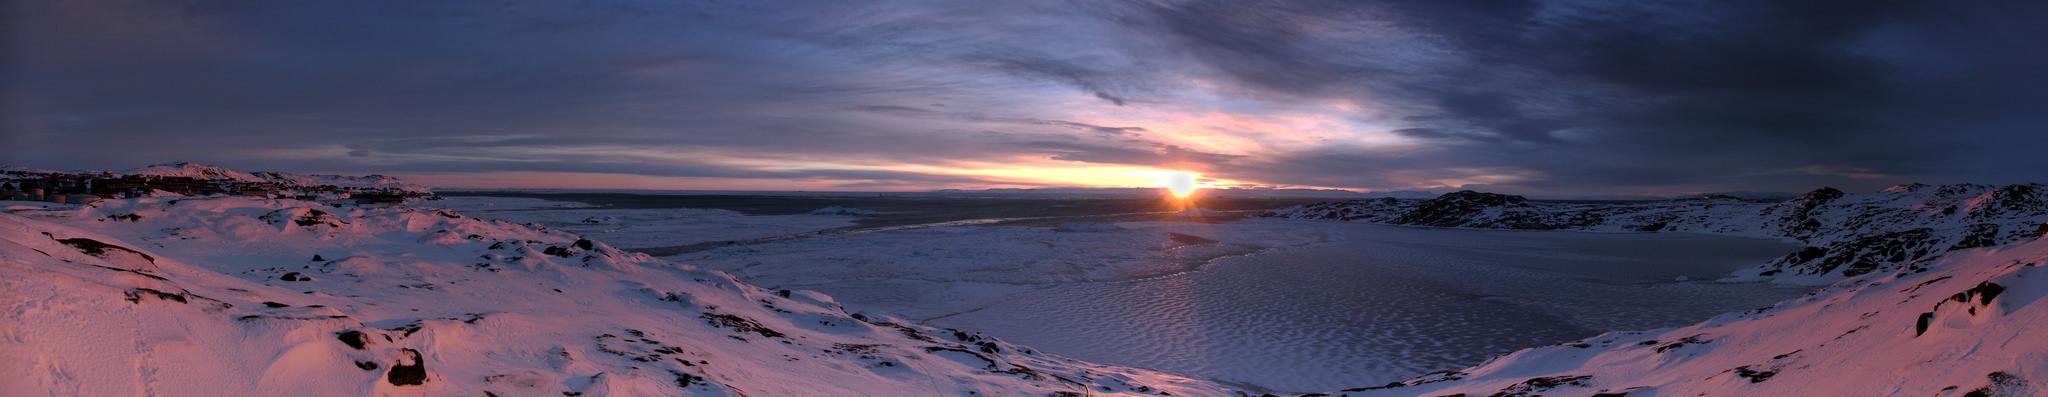 Ledové panorama, Rene Schwietzke